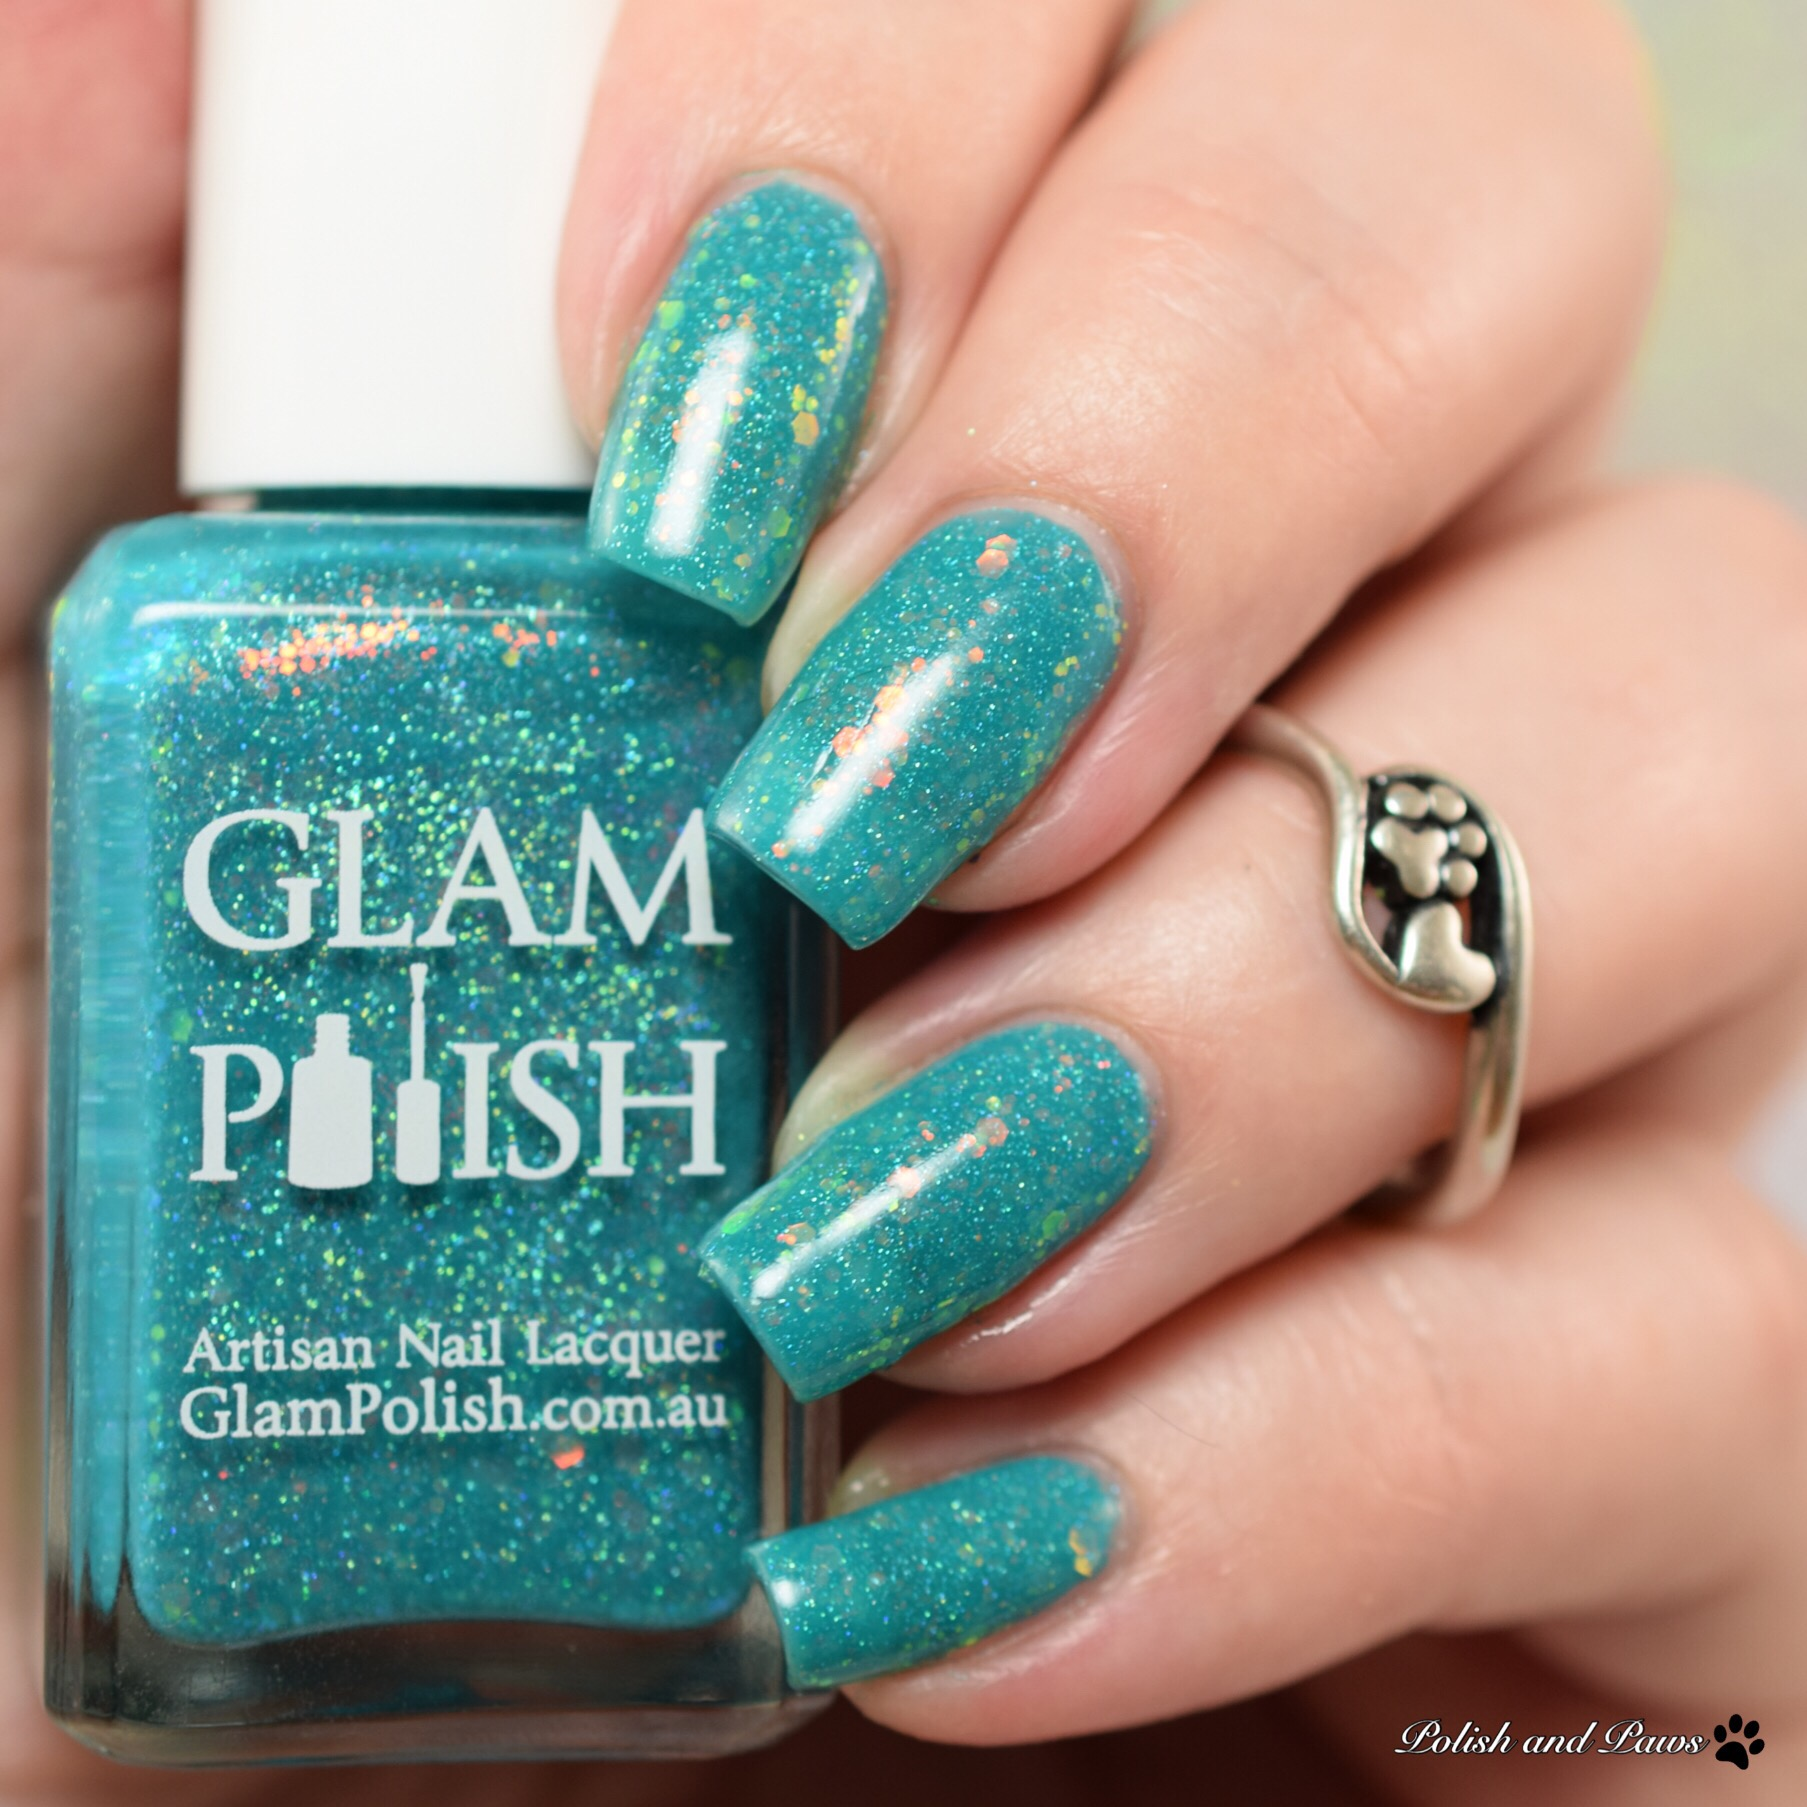 Glam Polish Chamber of Secrets